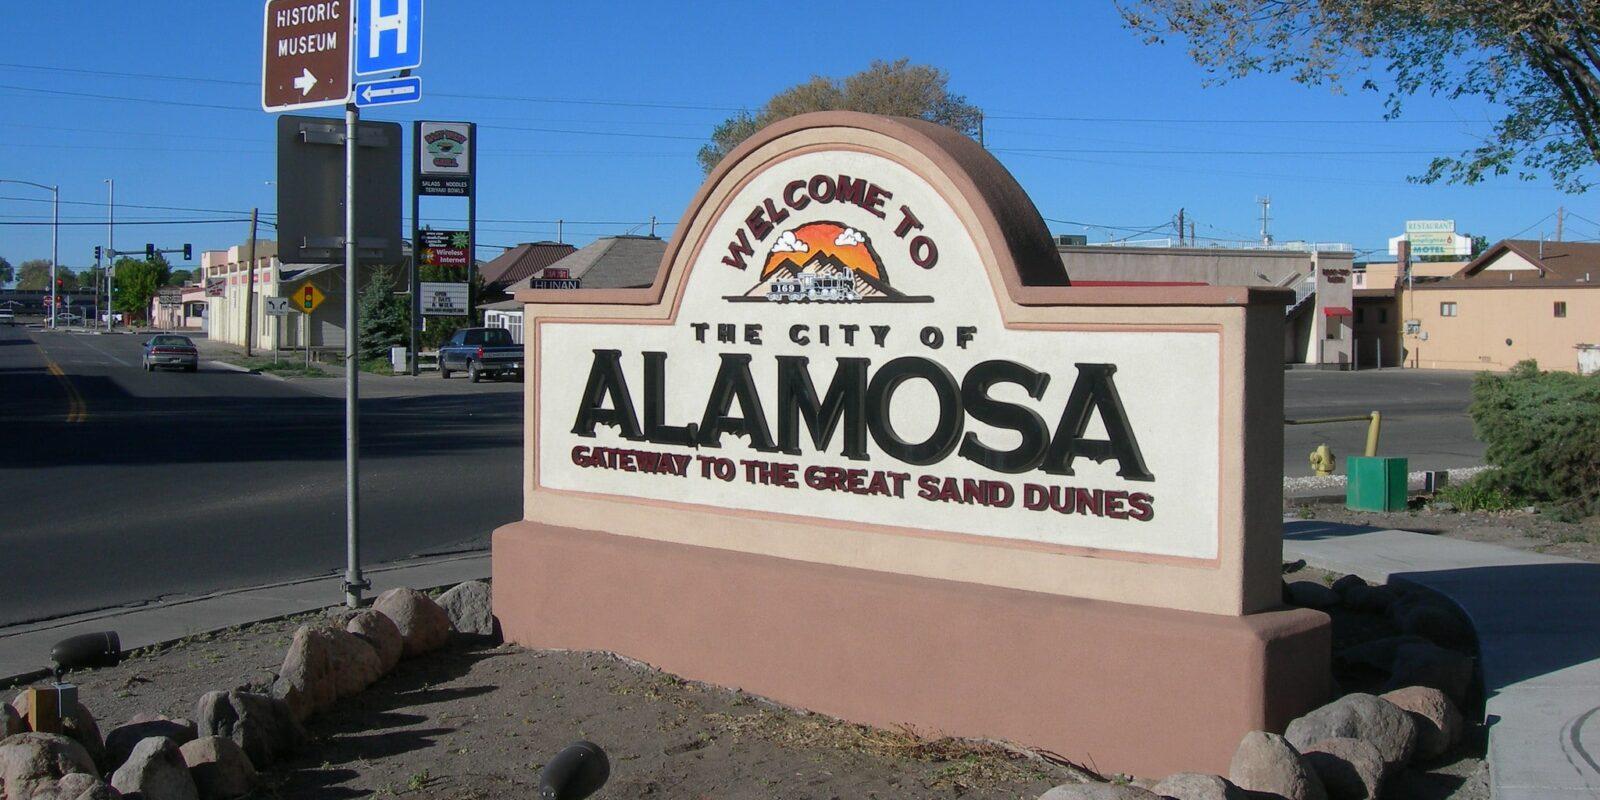 image of alamosa sign